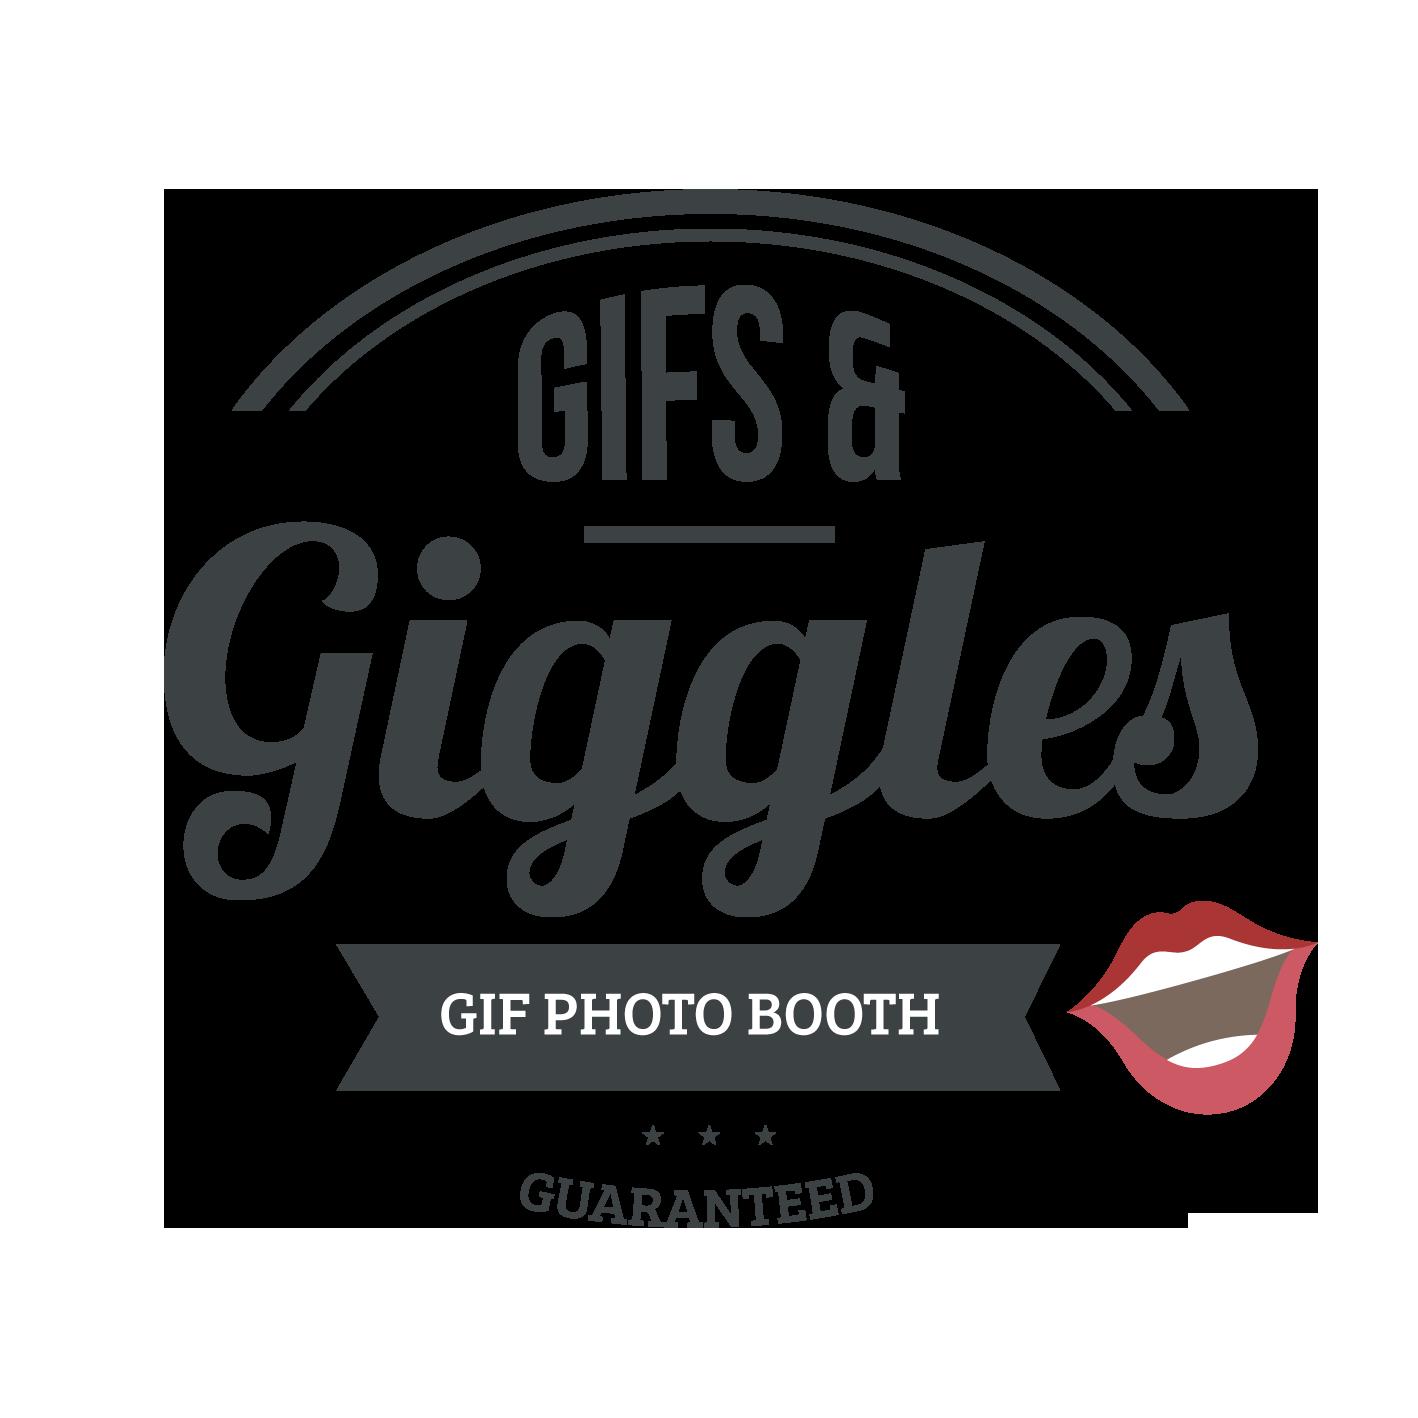 LMP-Gifs-&-Giggles-LOGO-FINAL.png